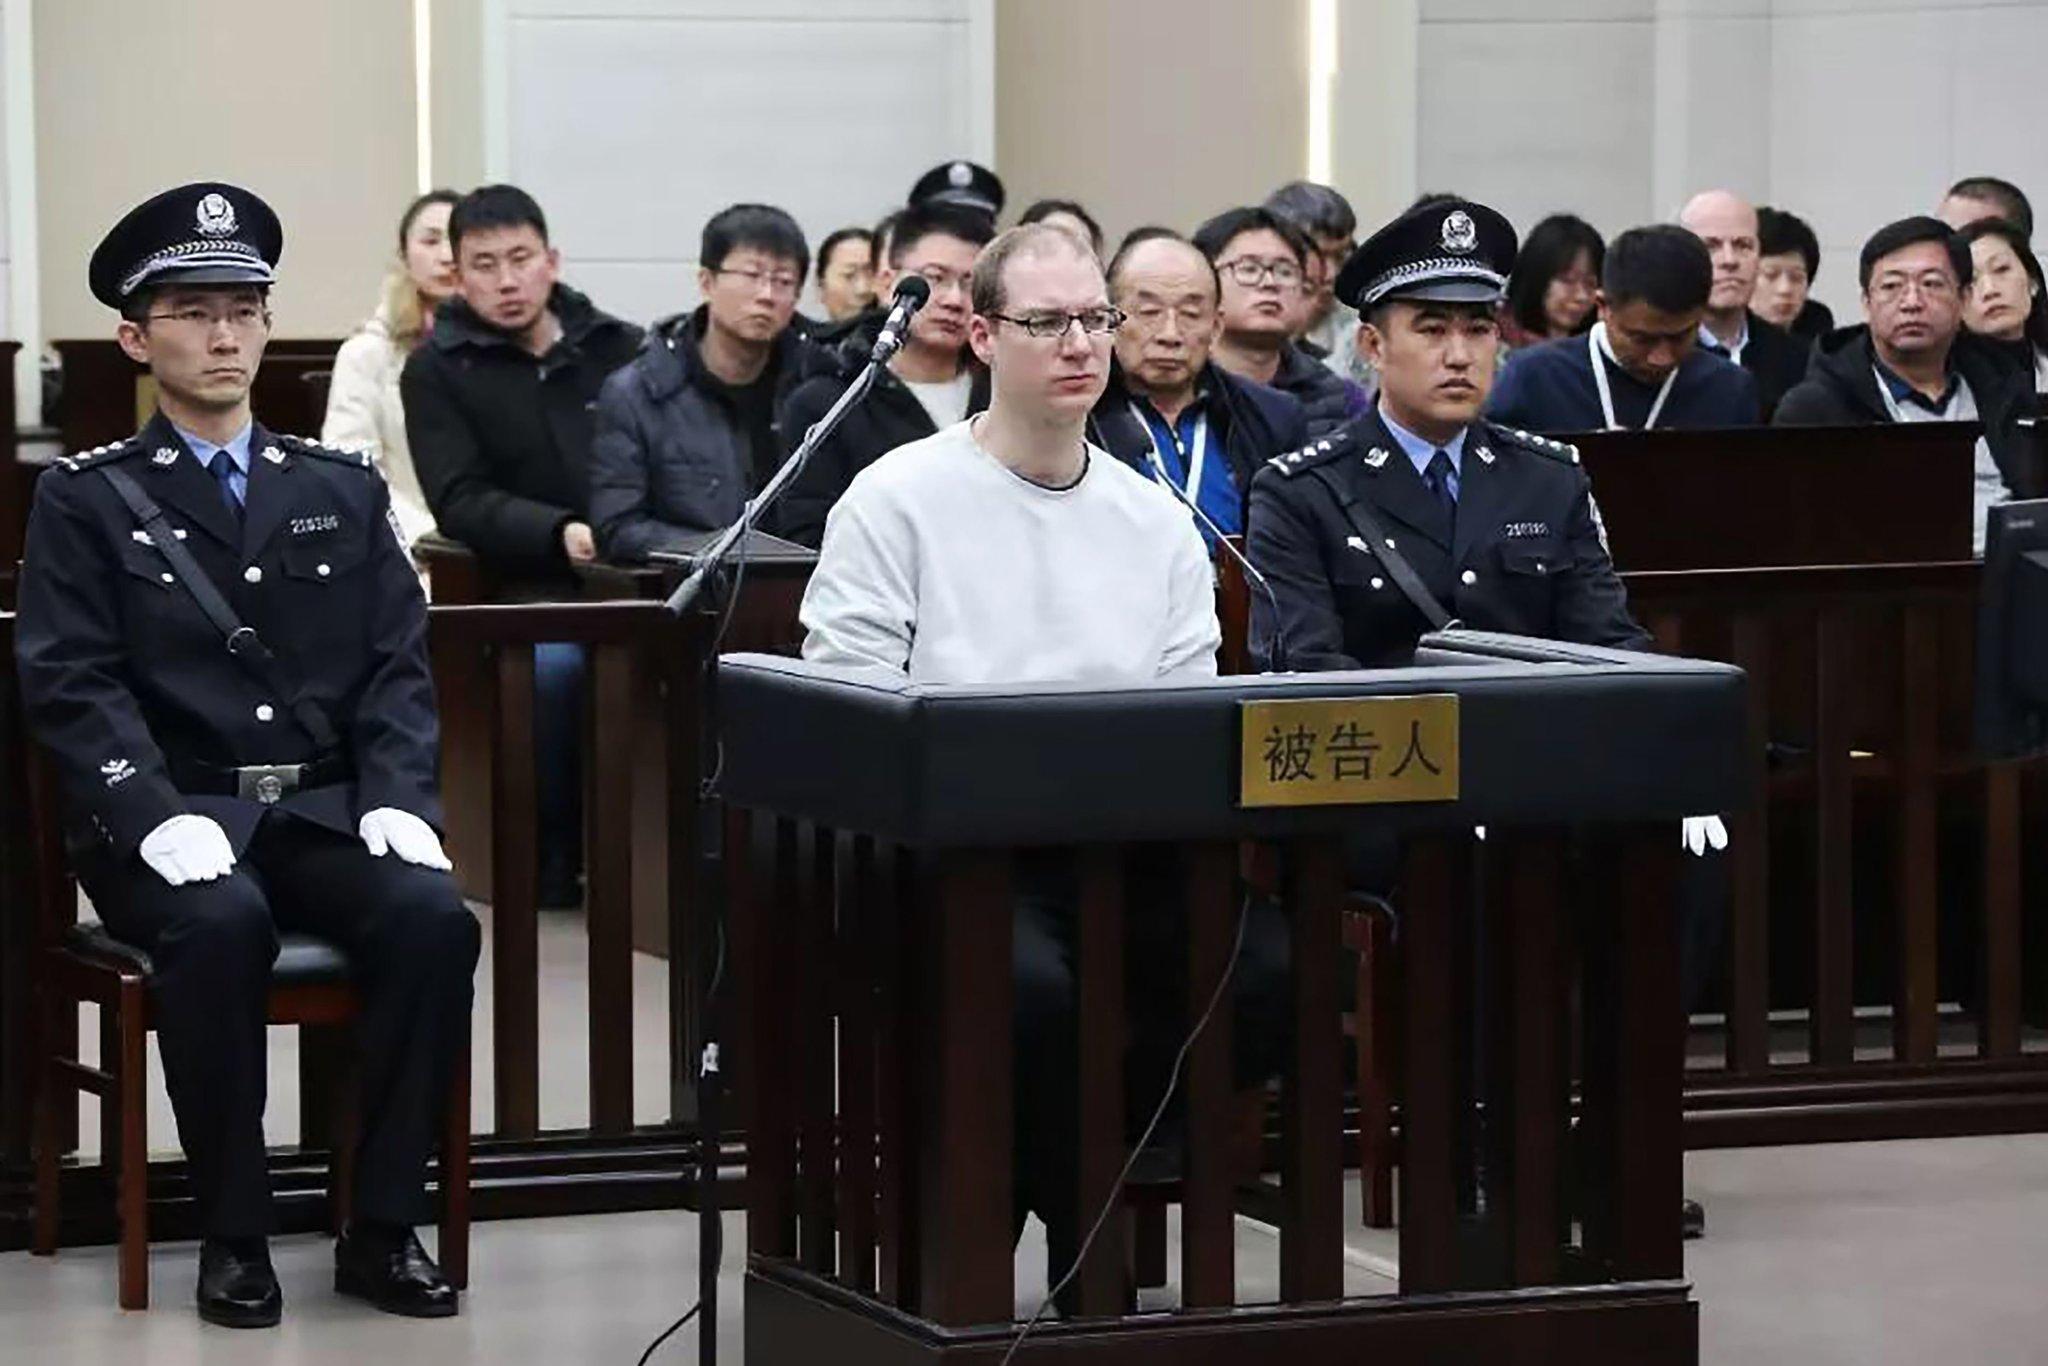 Beijing urges Ottawa stop wrongly criticizing Chinese court decision